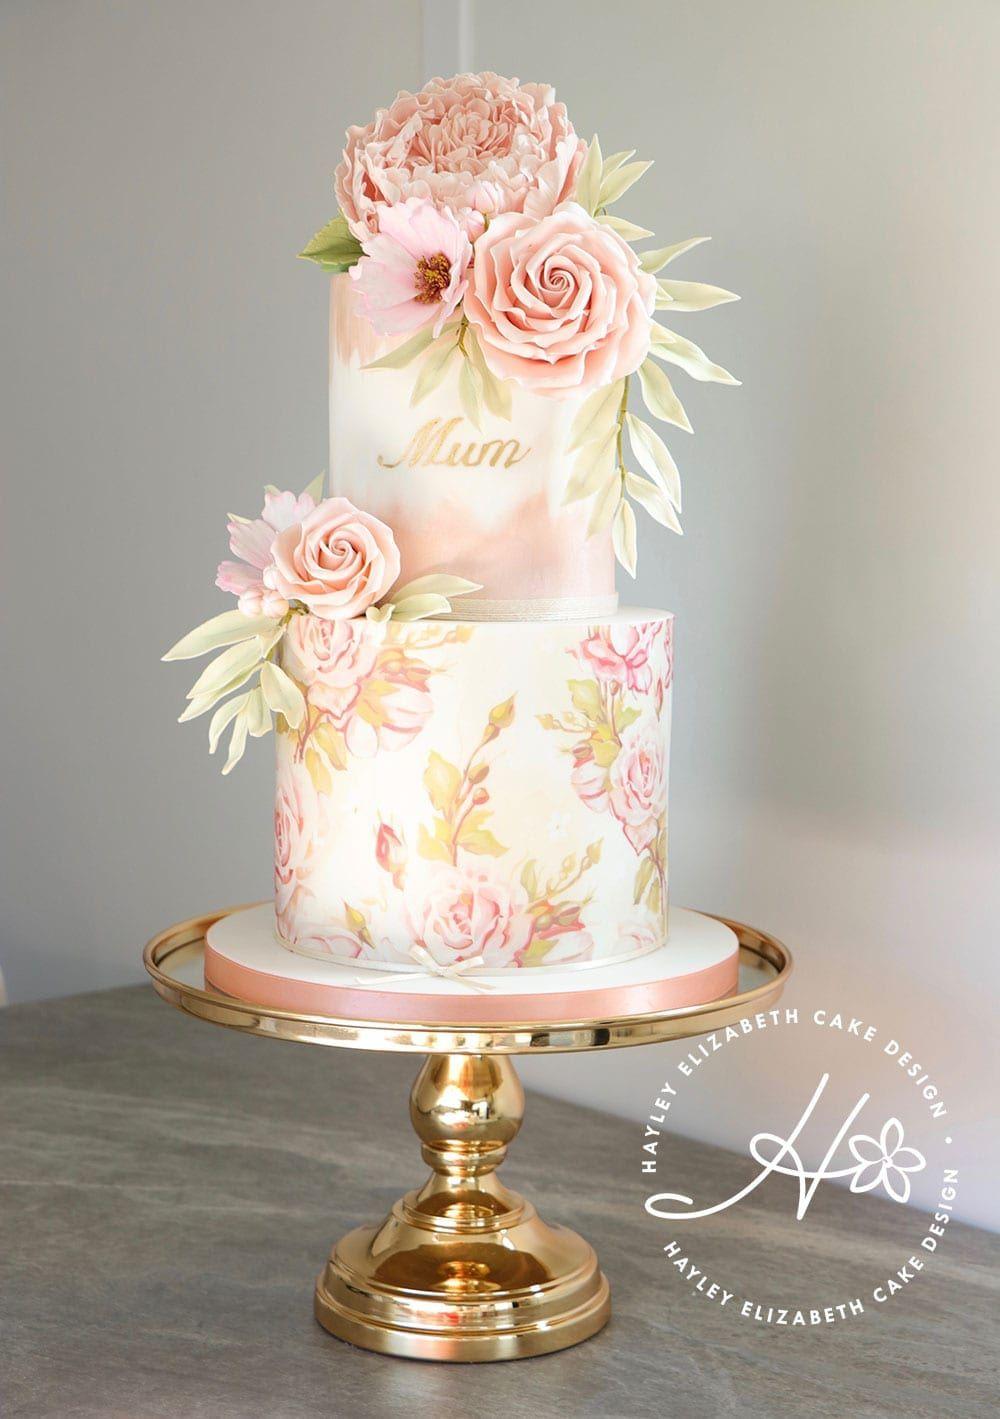 Celebration Cakes by in 2020 Elegant birthday cakes